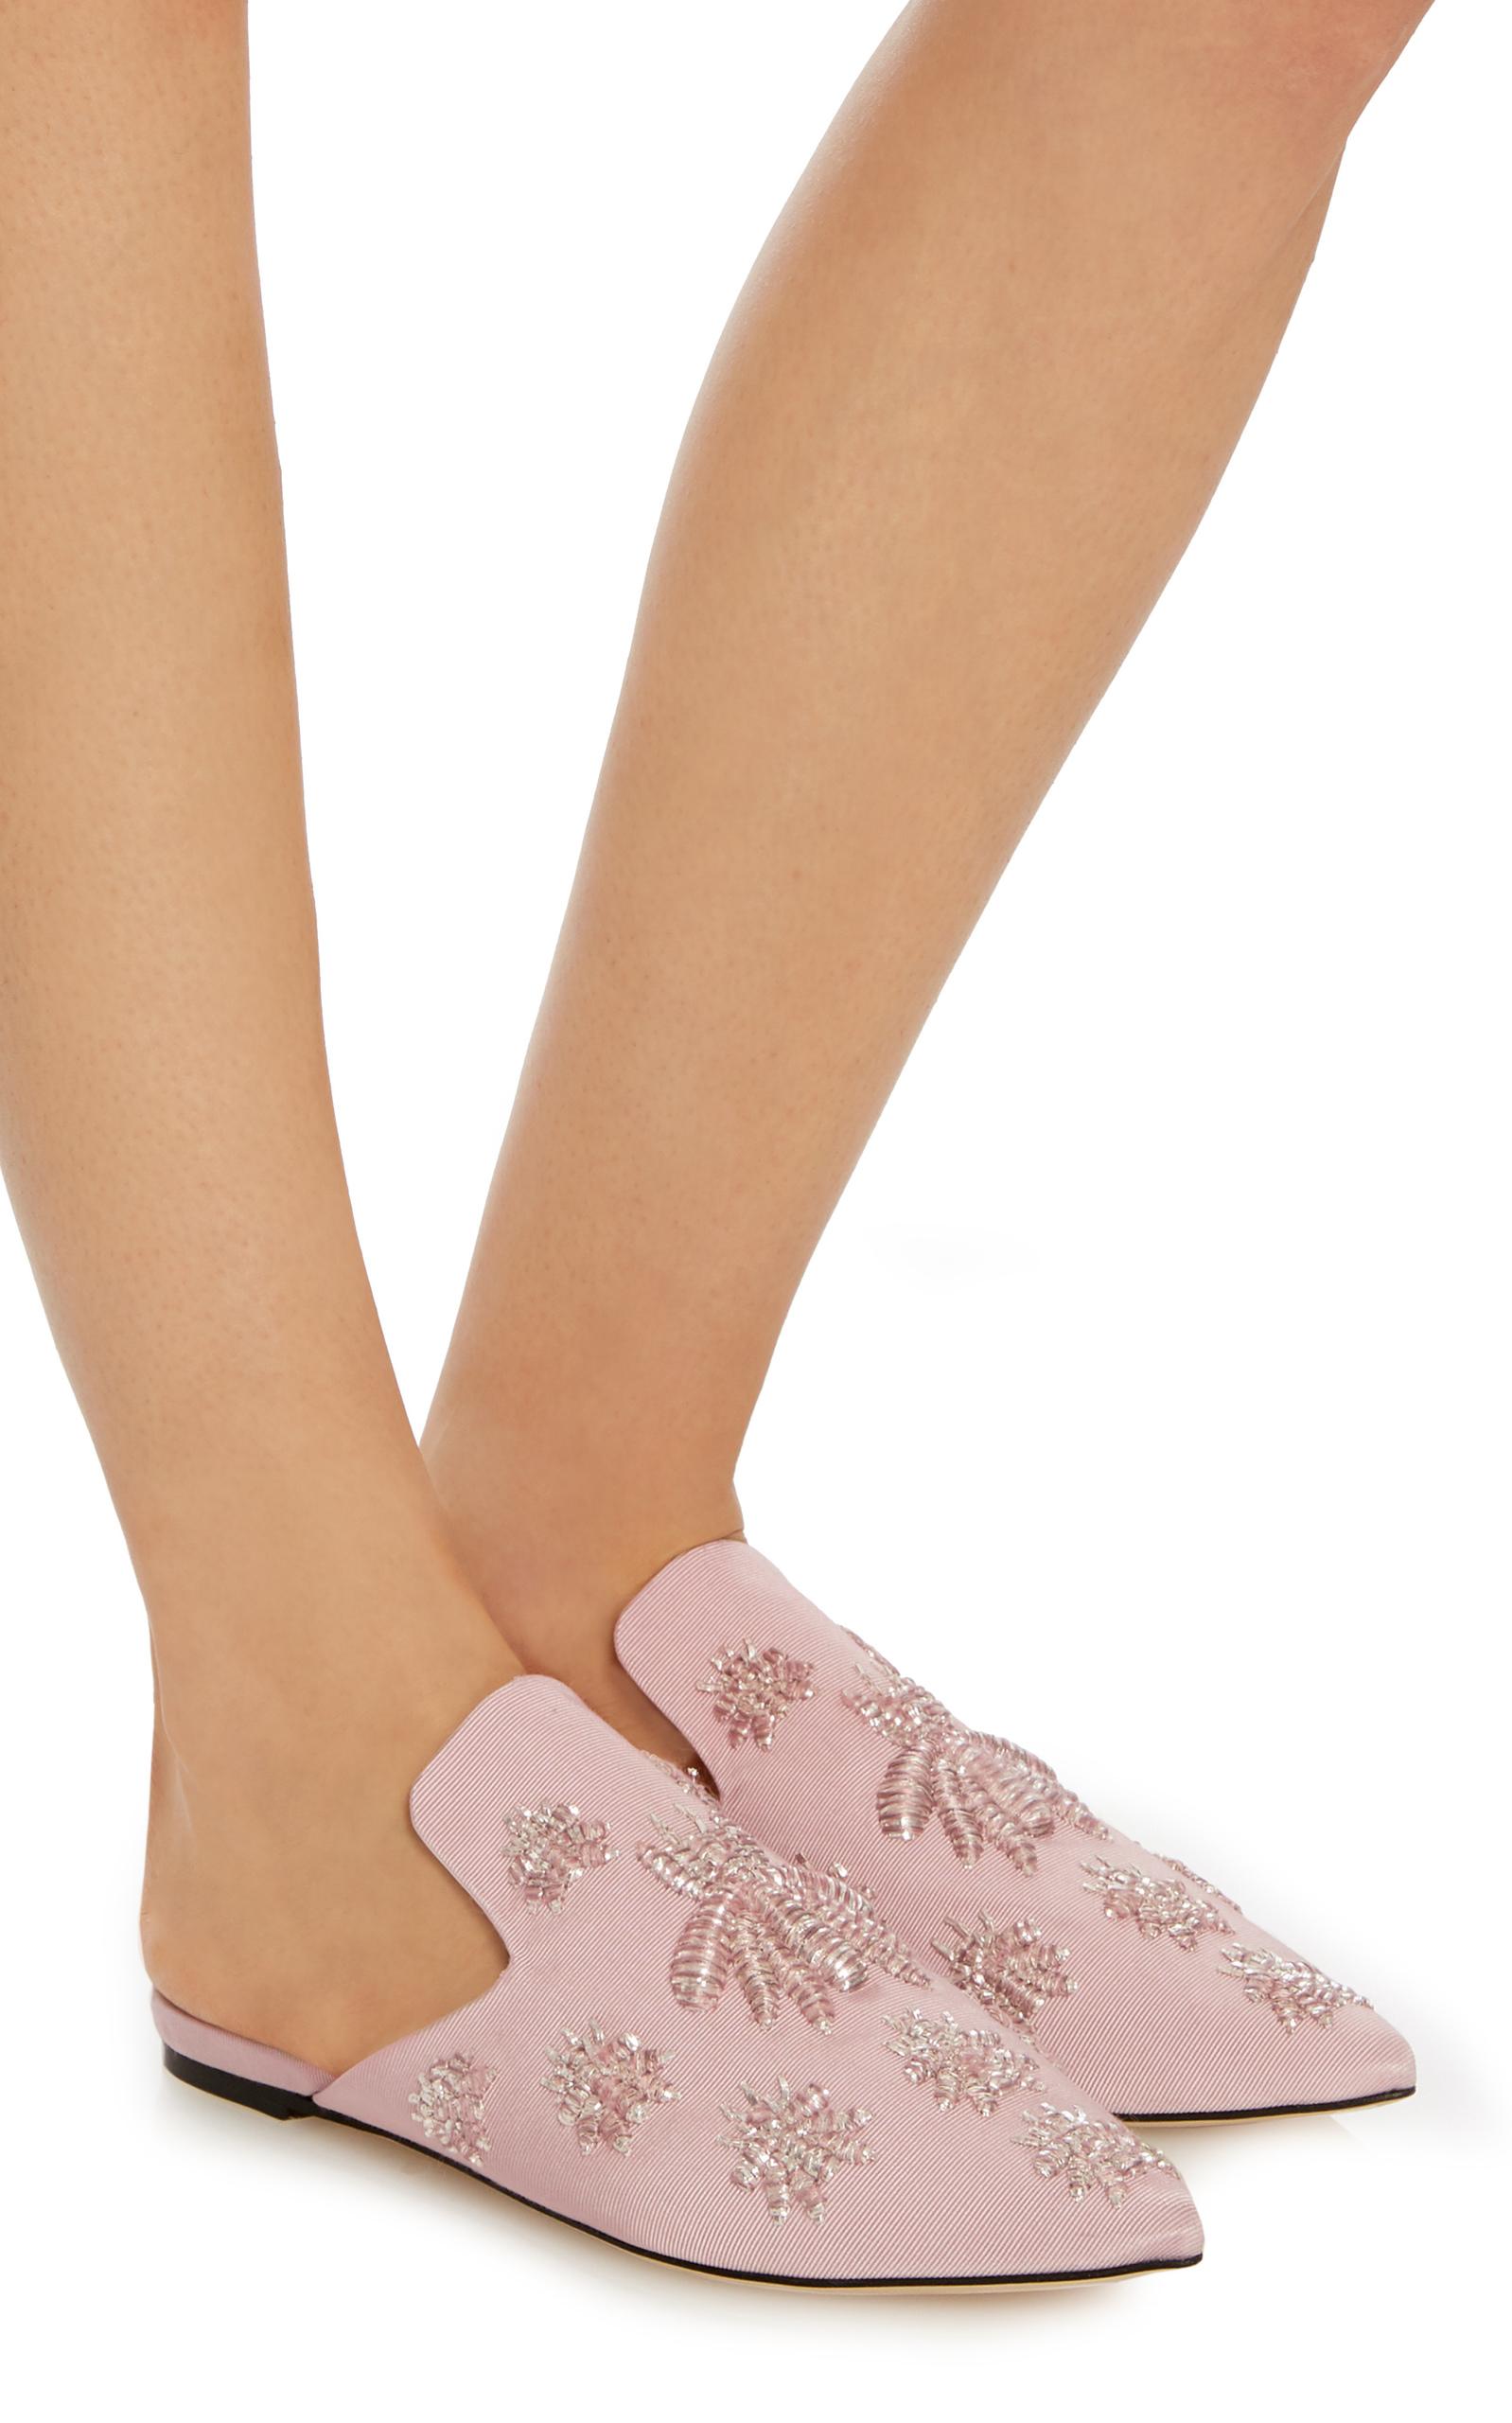 c9e7212d1901 Sanayi 313Rango Embroidered Woven Slippers. CLOSE. Loading